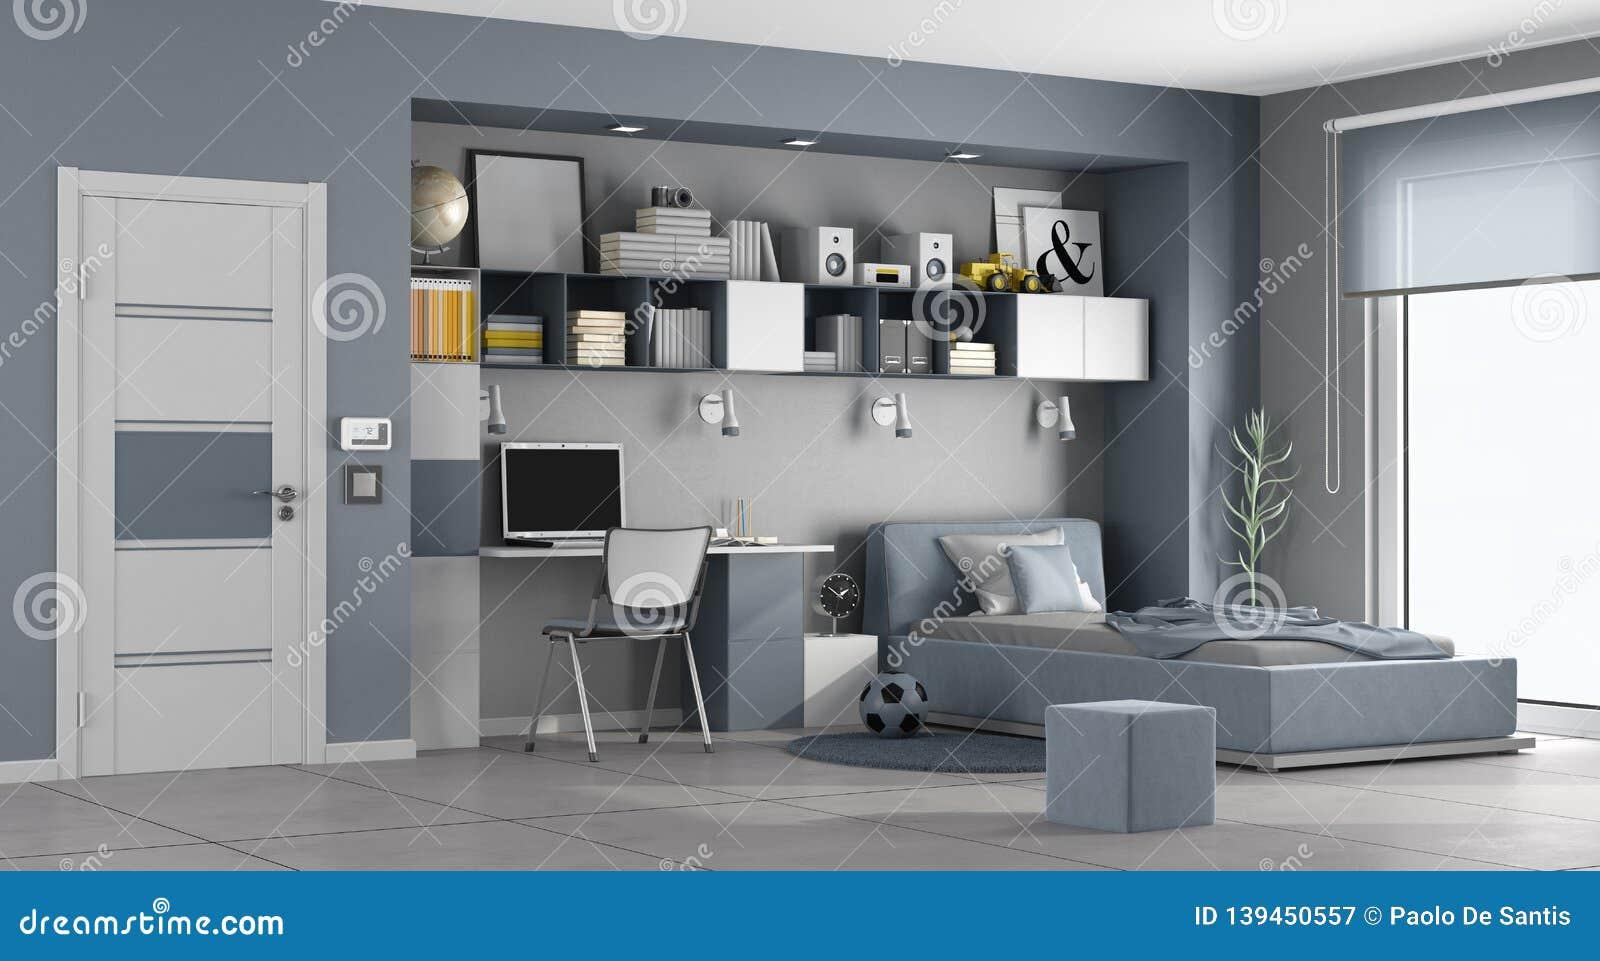 Blue And Gray Teen Room Stock Illustration Illustration Of